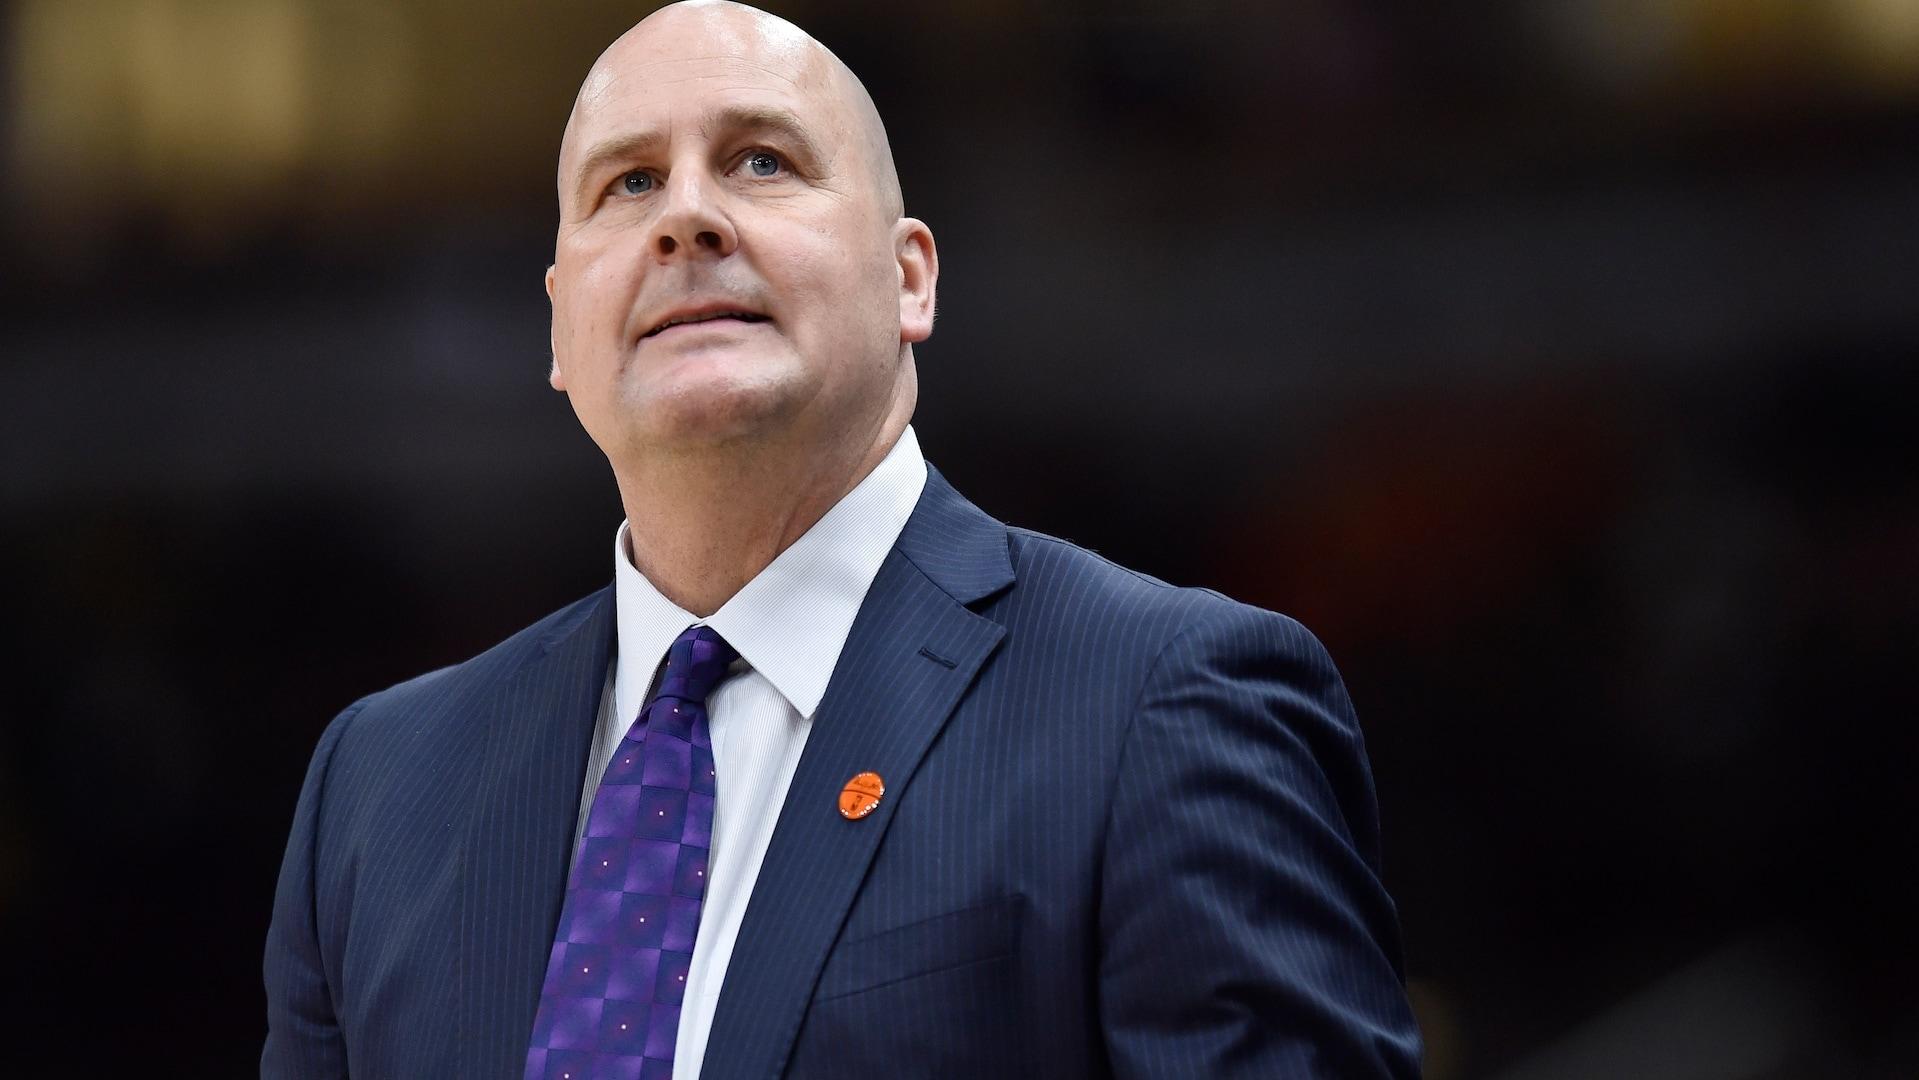 Bulls part ways with coach Jim Boylen